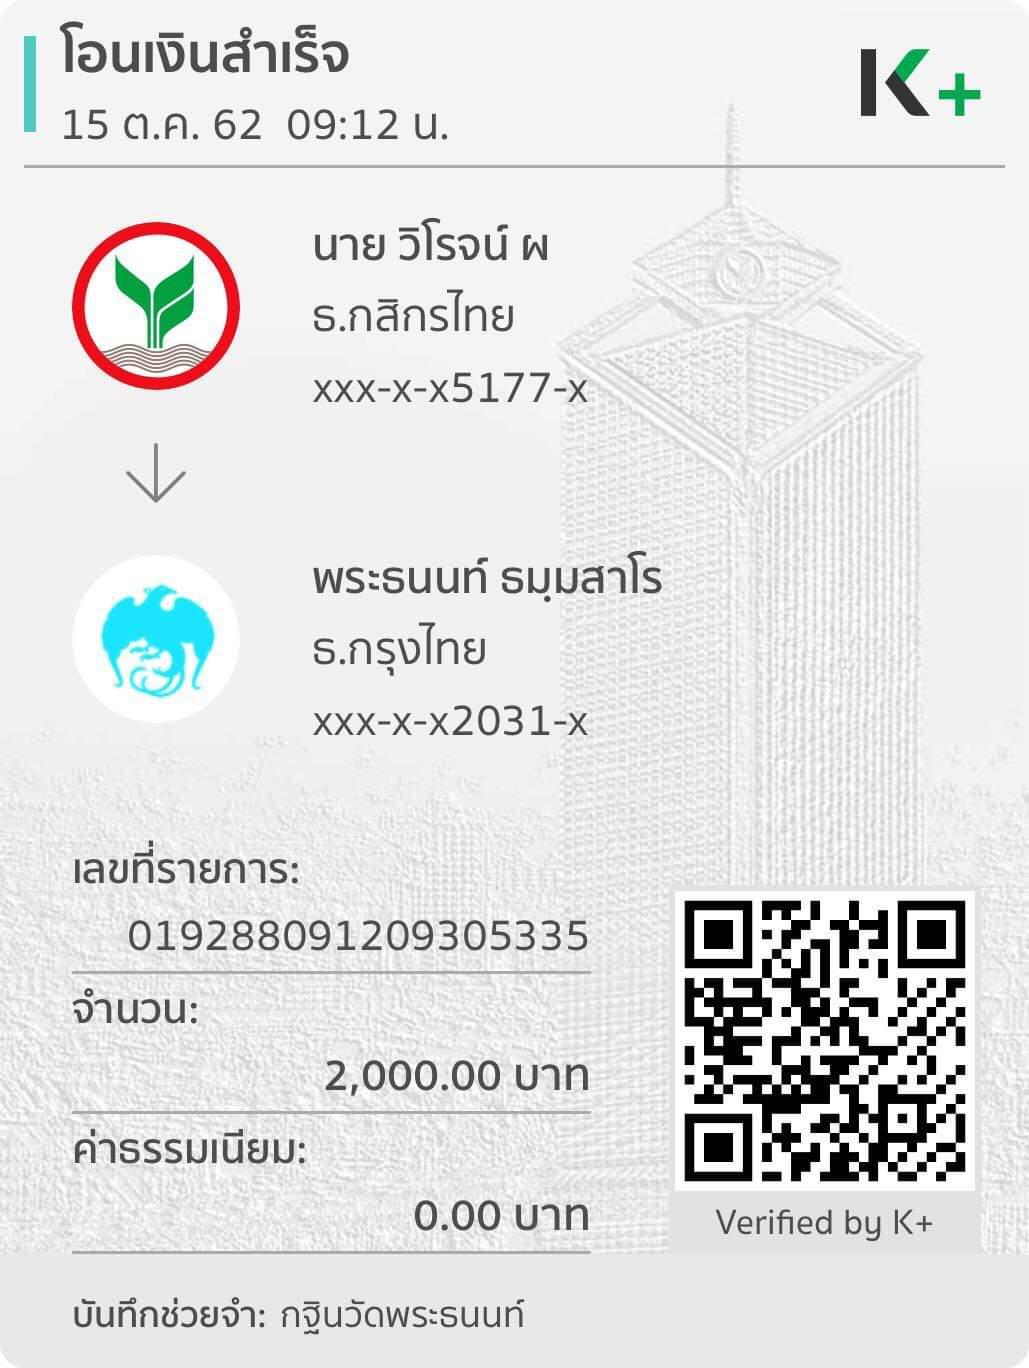 received_415609702474792.jpeg